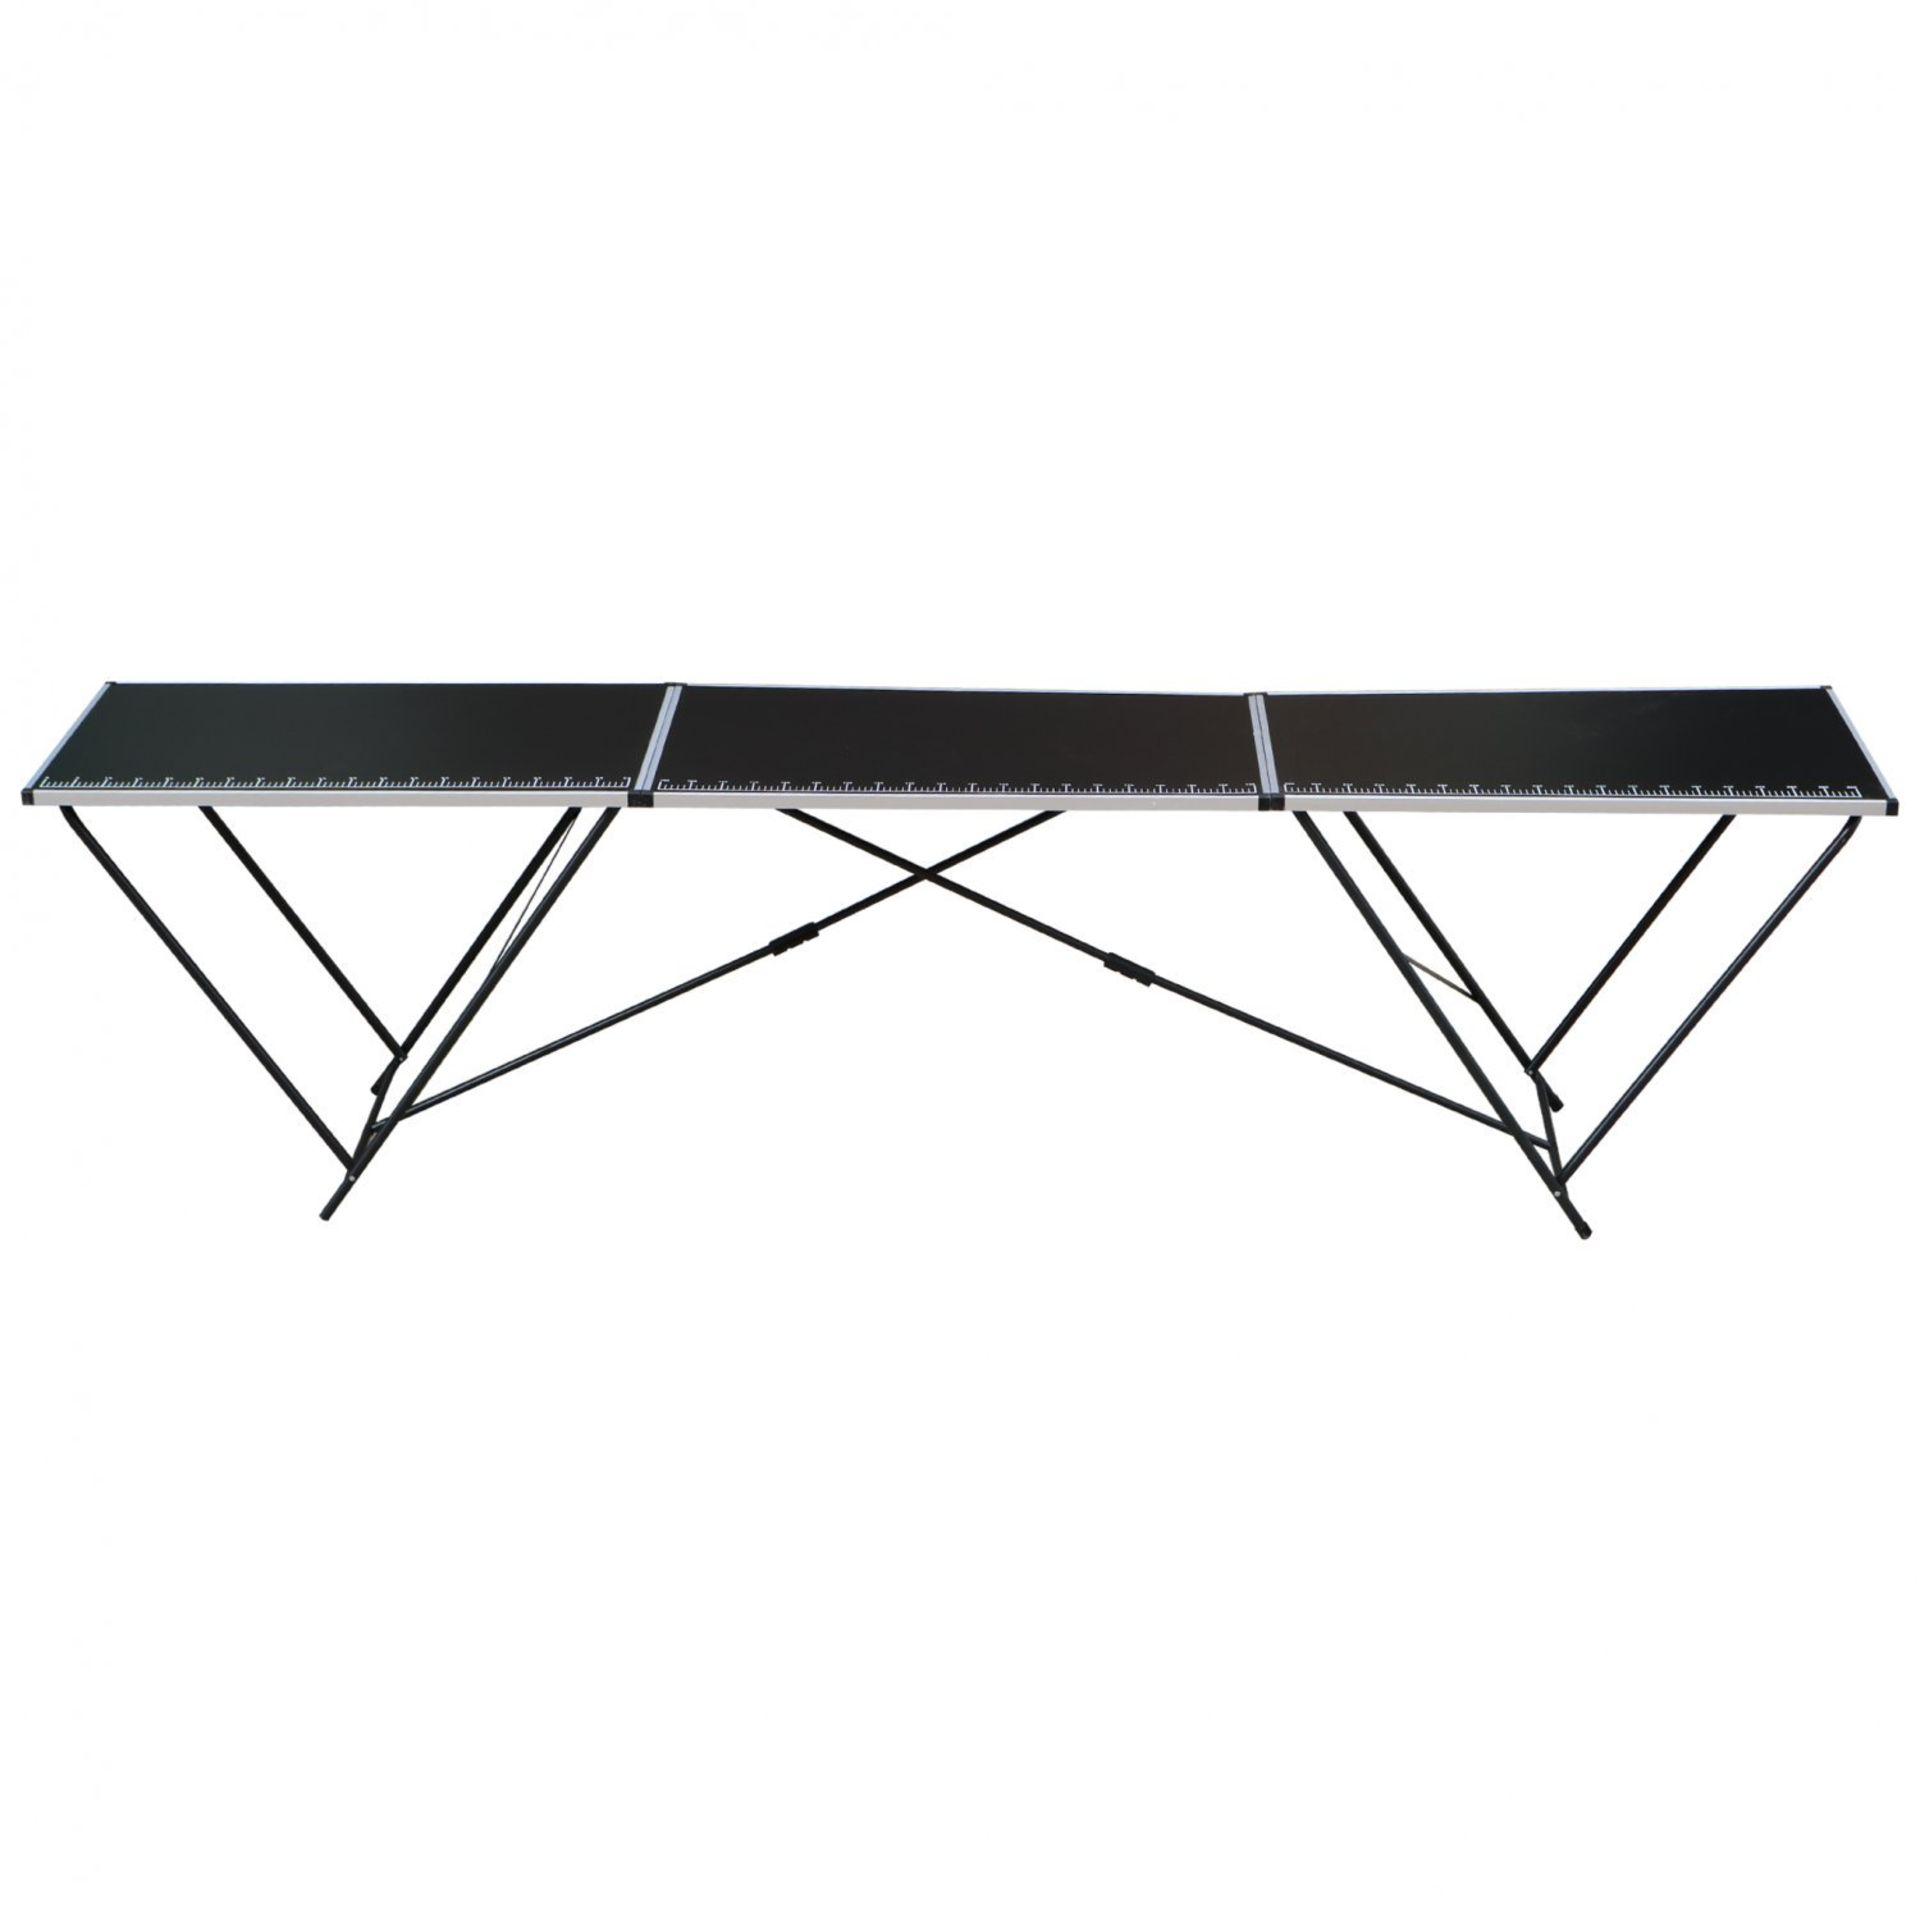 Lot 262 - (KK56) 3m Aluminium Folding Wallpaper Pasting Decorating Table The pasting table is ideal fo...